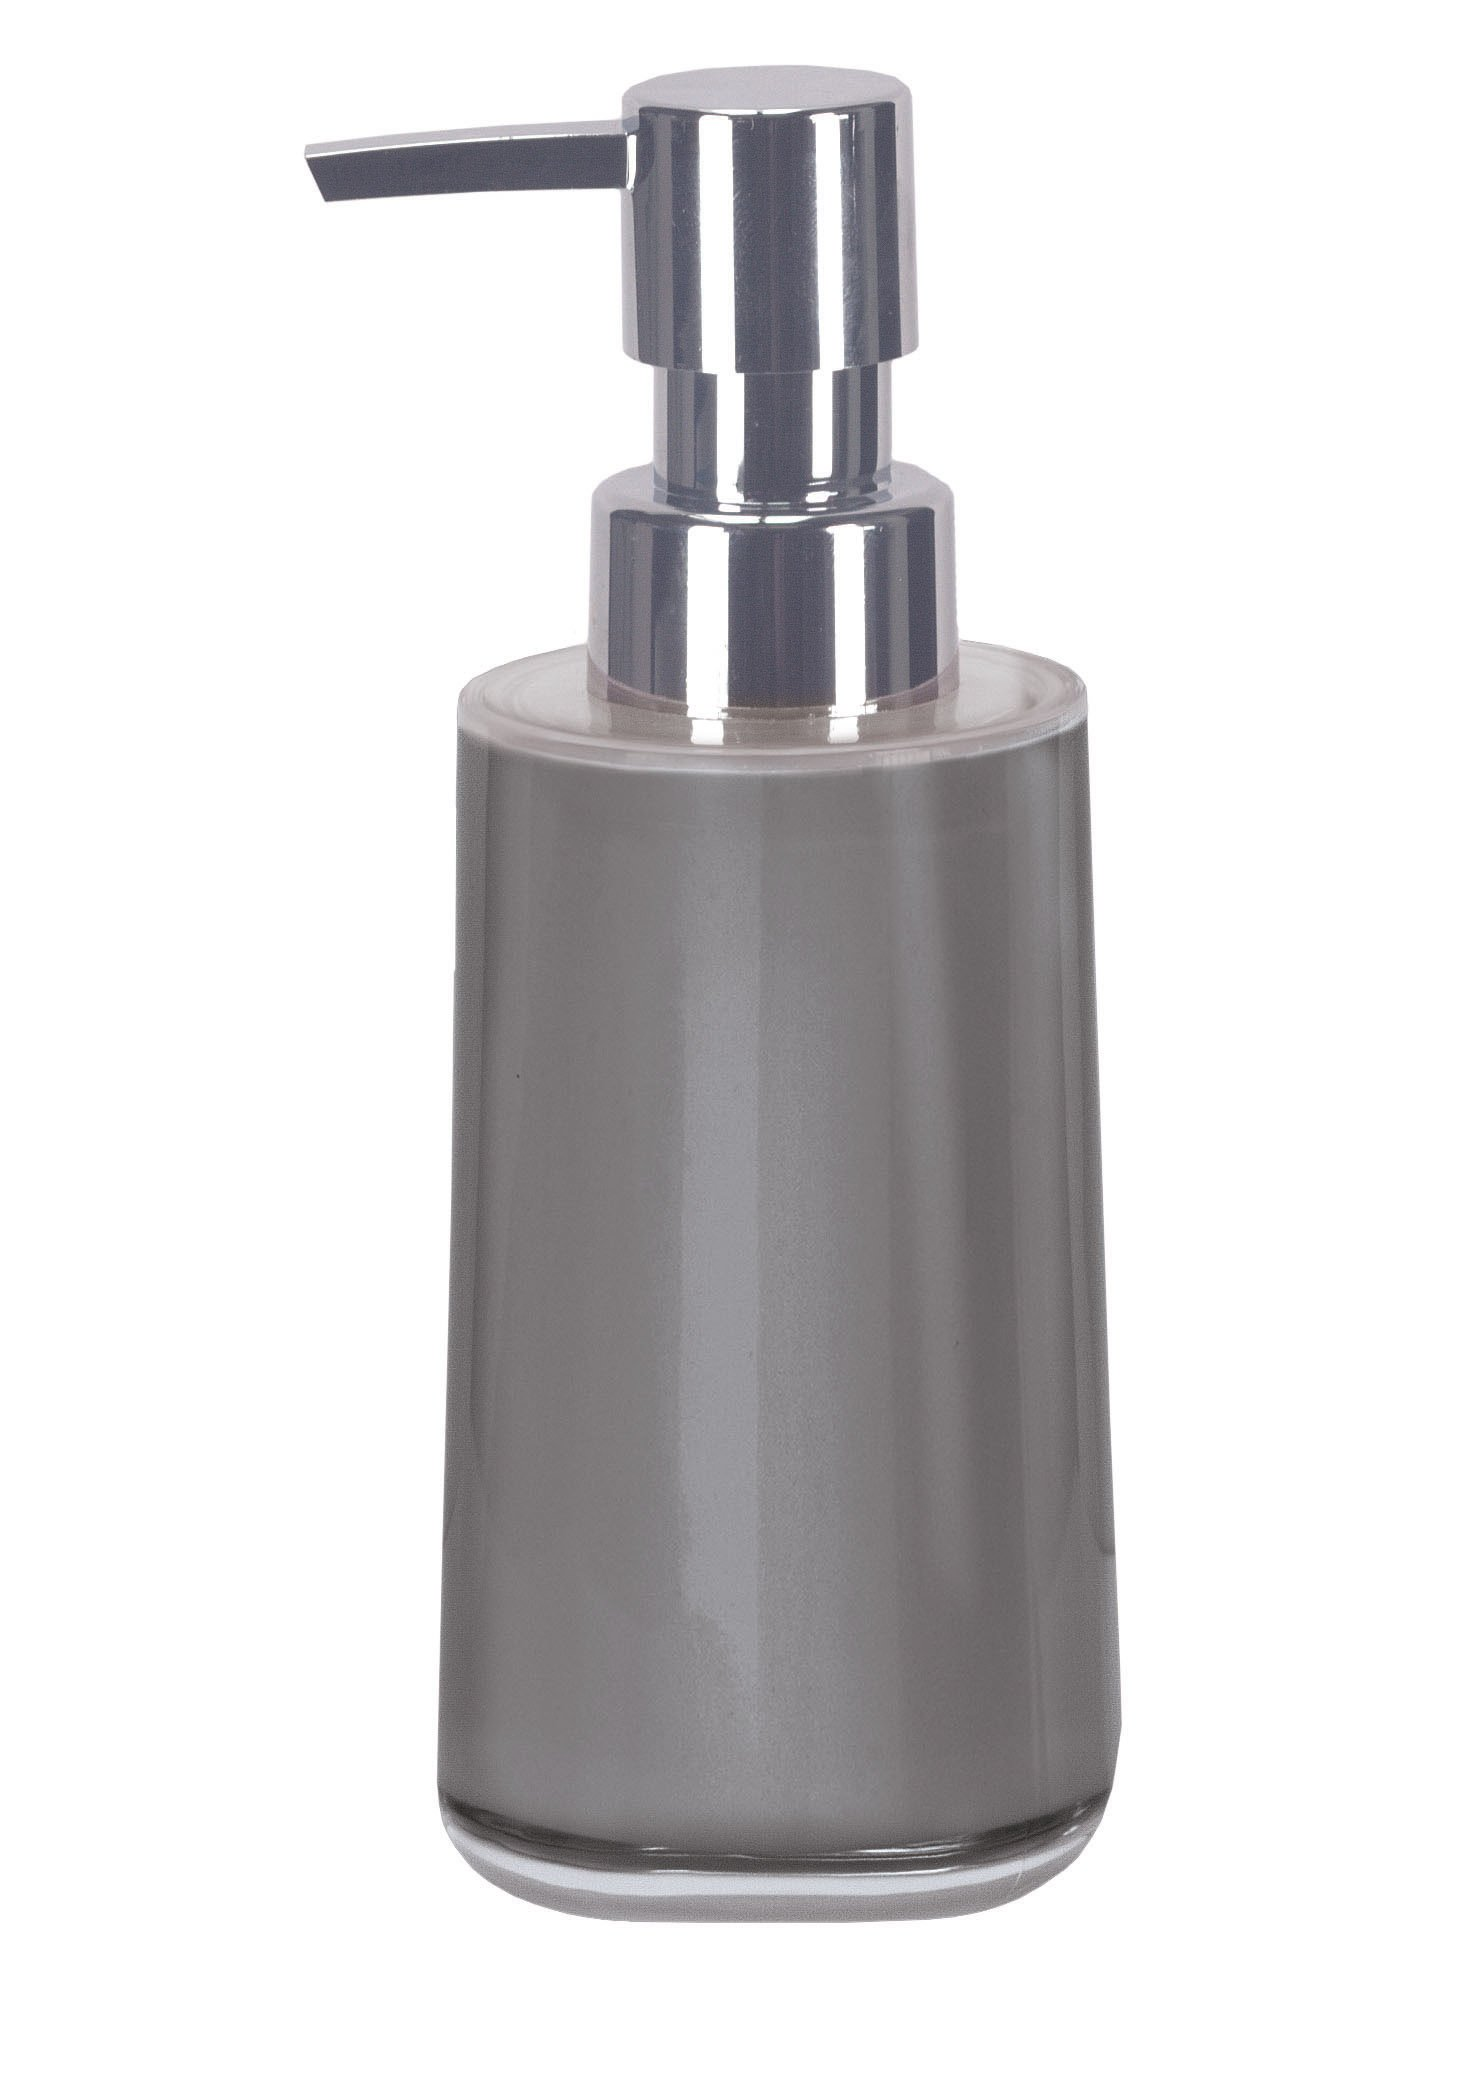 Seifenspender Mable Platin B:6,5cm